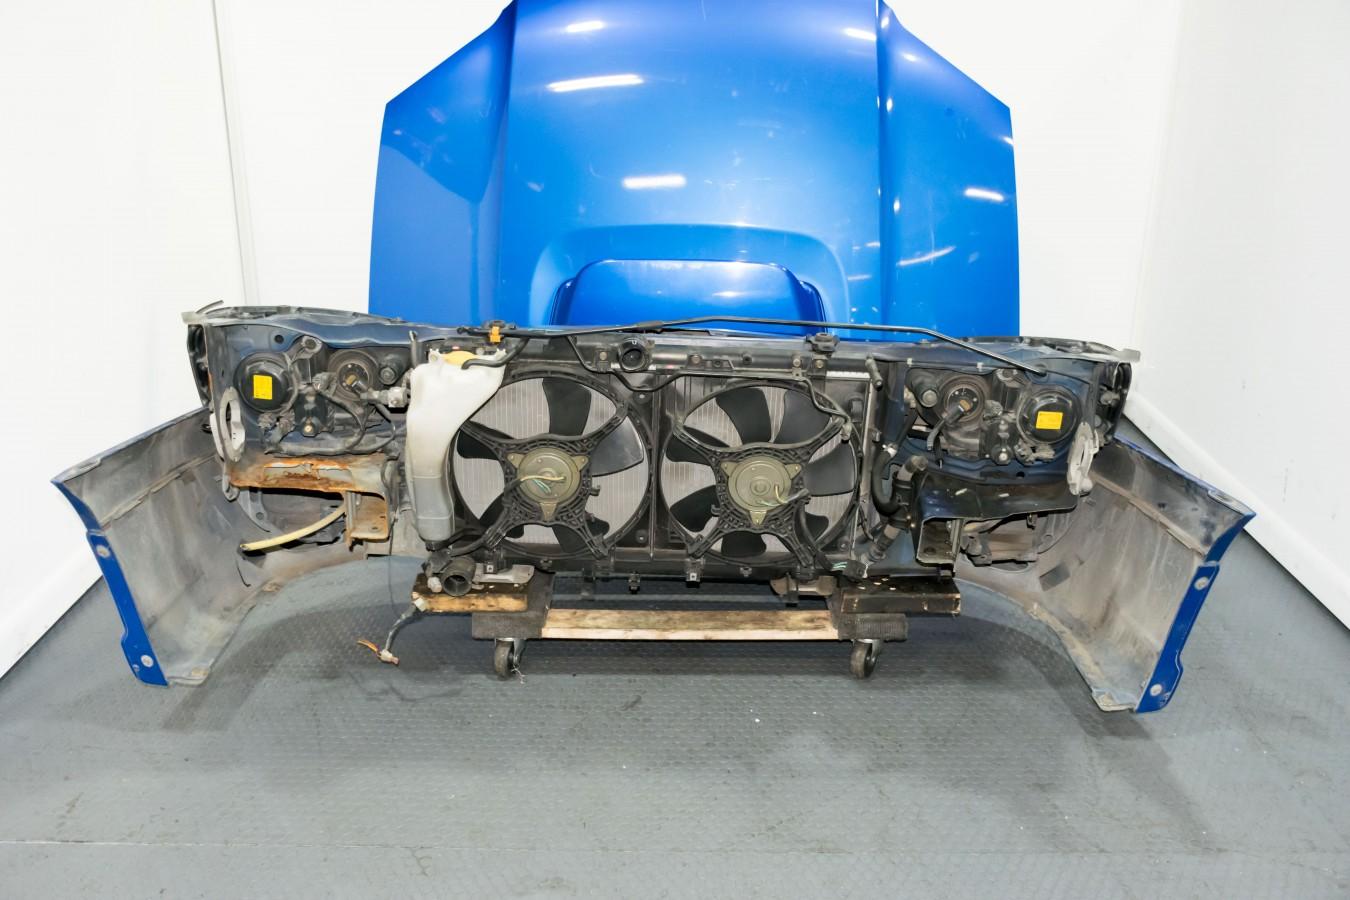 Used Subaru Wrx Sti For Sale >> Used JDM Subaru Impreza WRX Blobeye 2004 2005 Front Cut ...